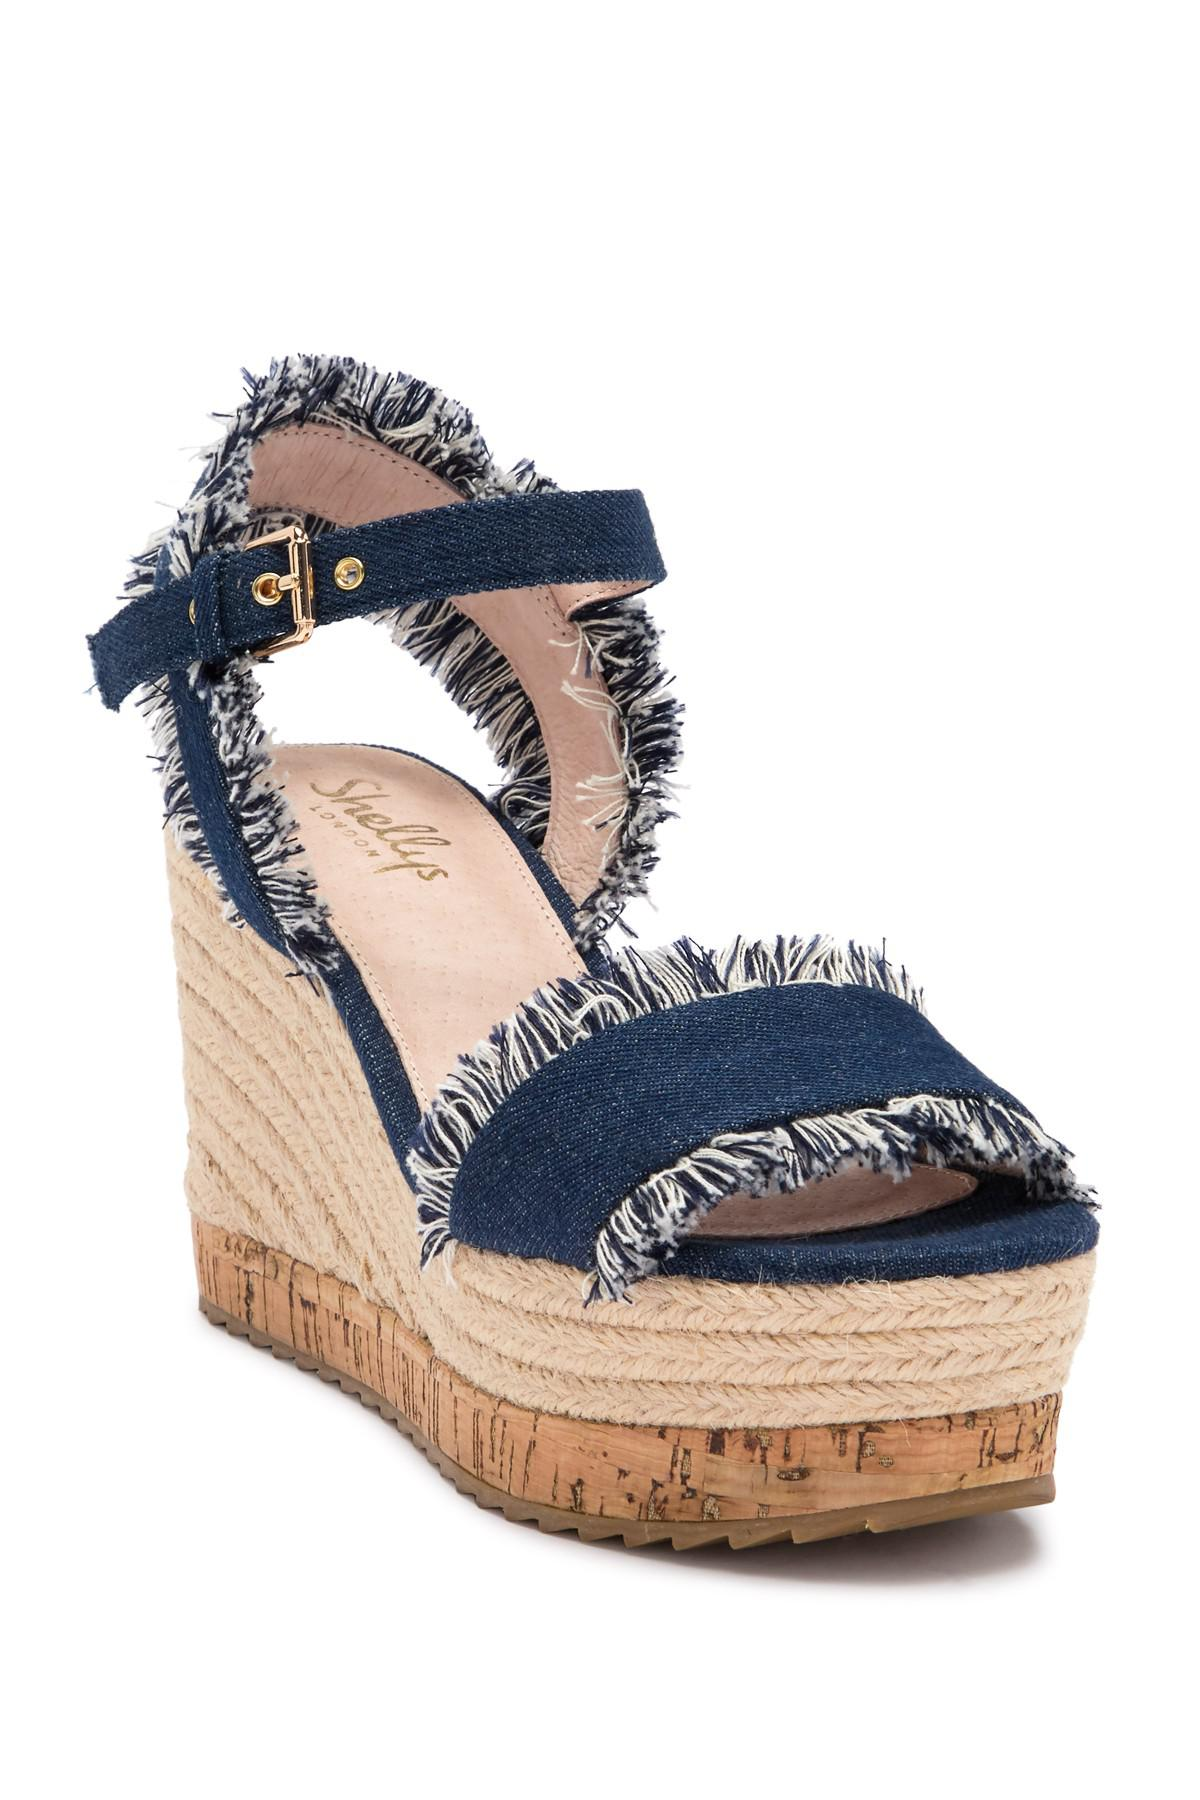 12bea819142 Lyst - Shellys London Daphne Wedge Sandal in Blue